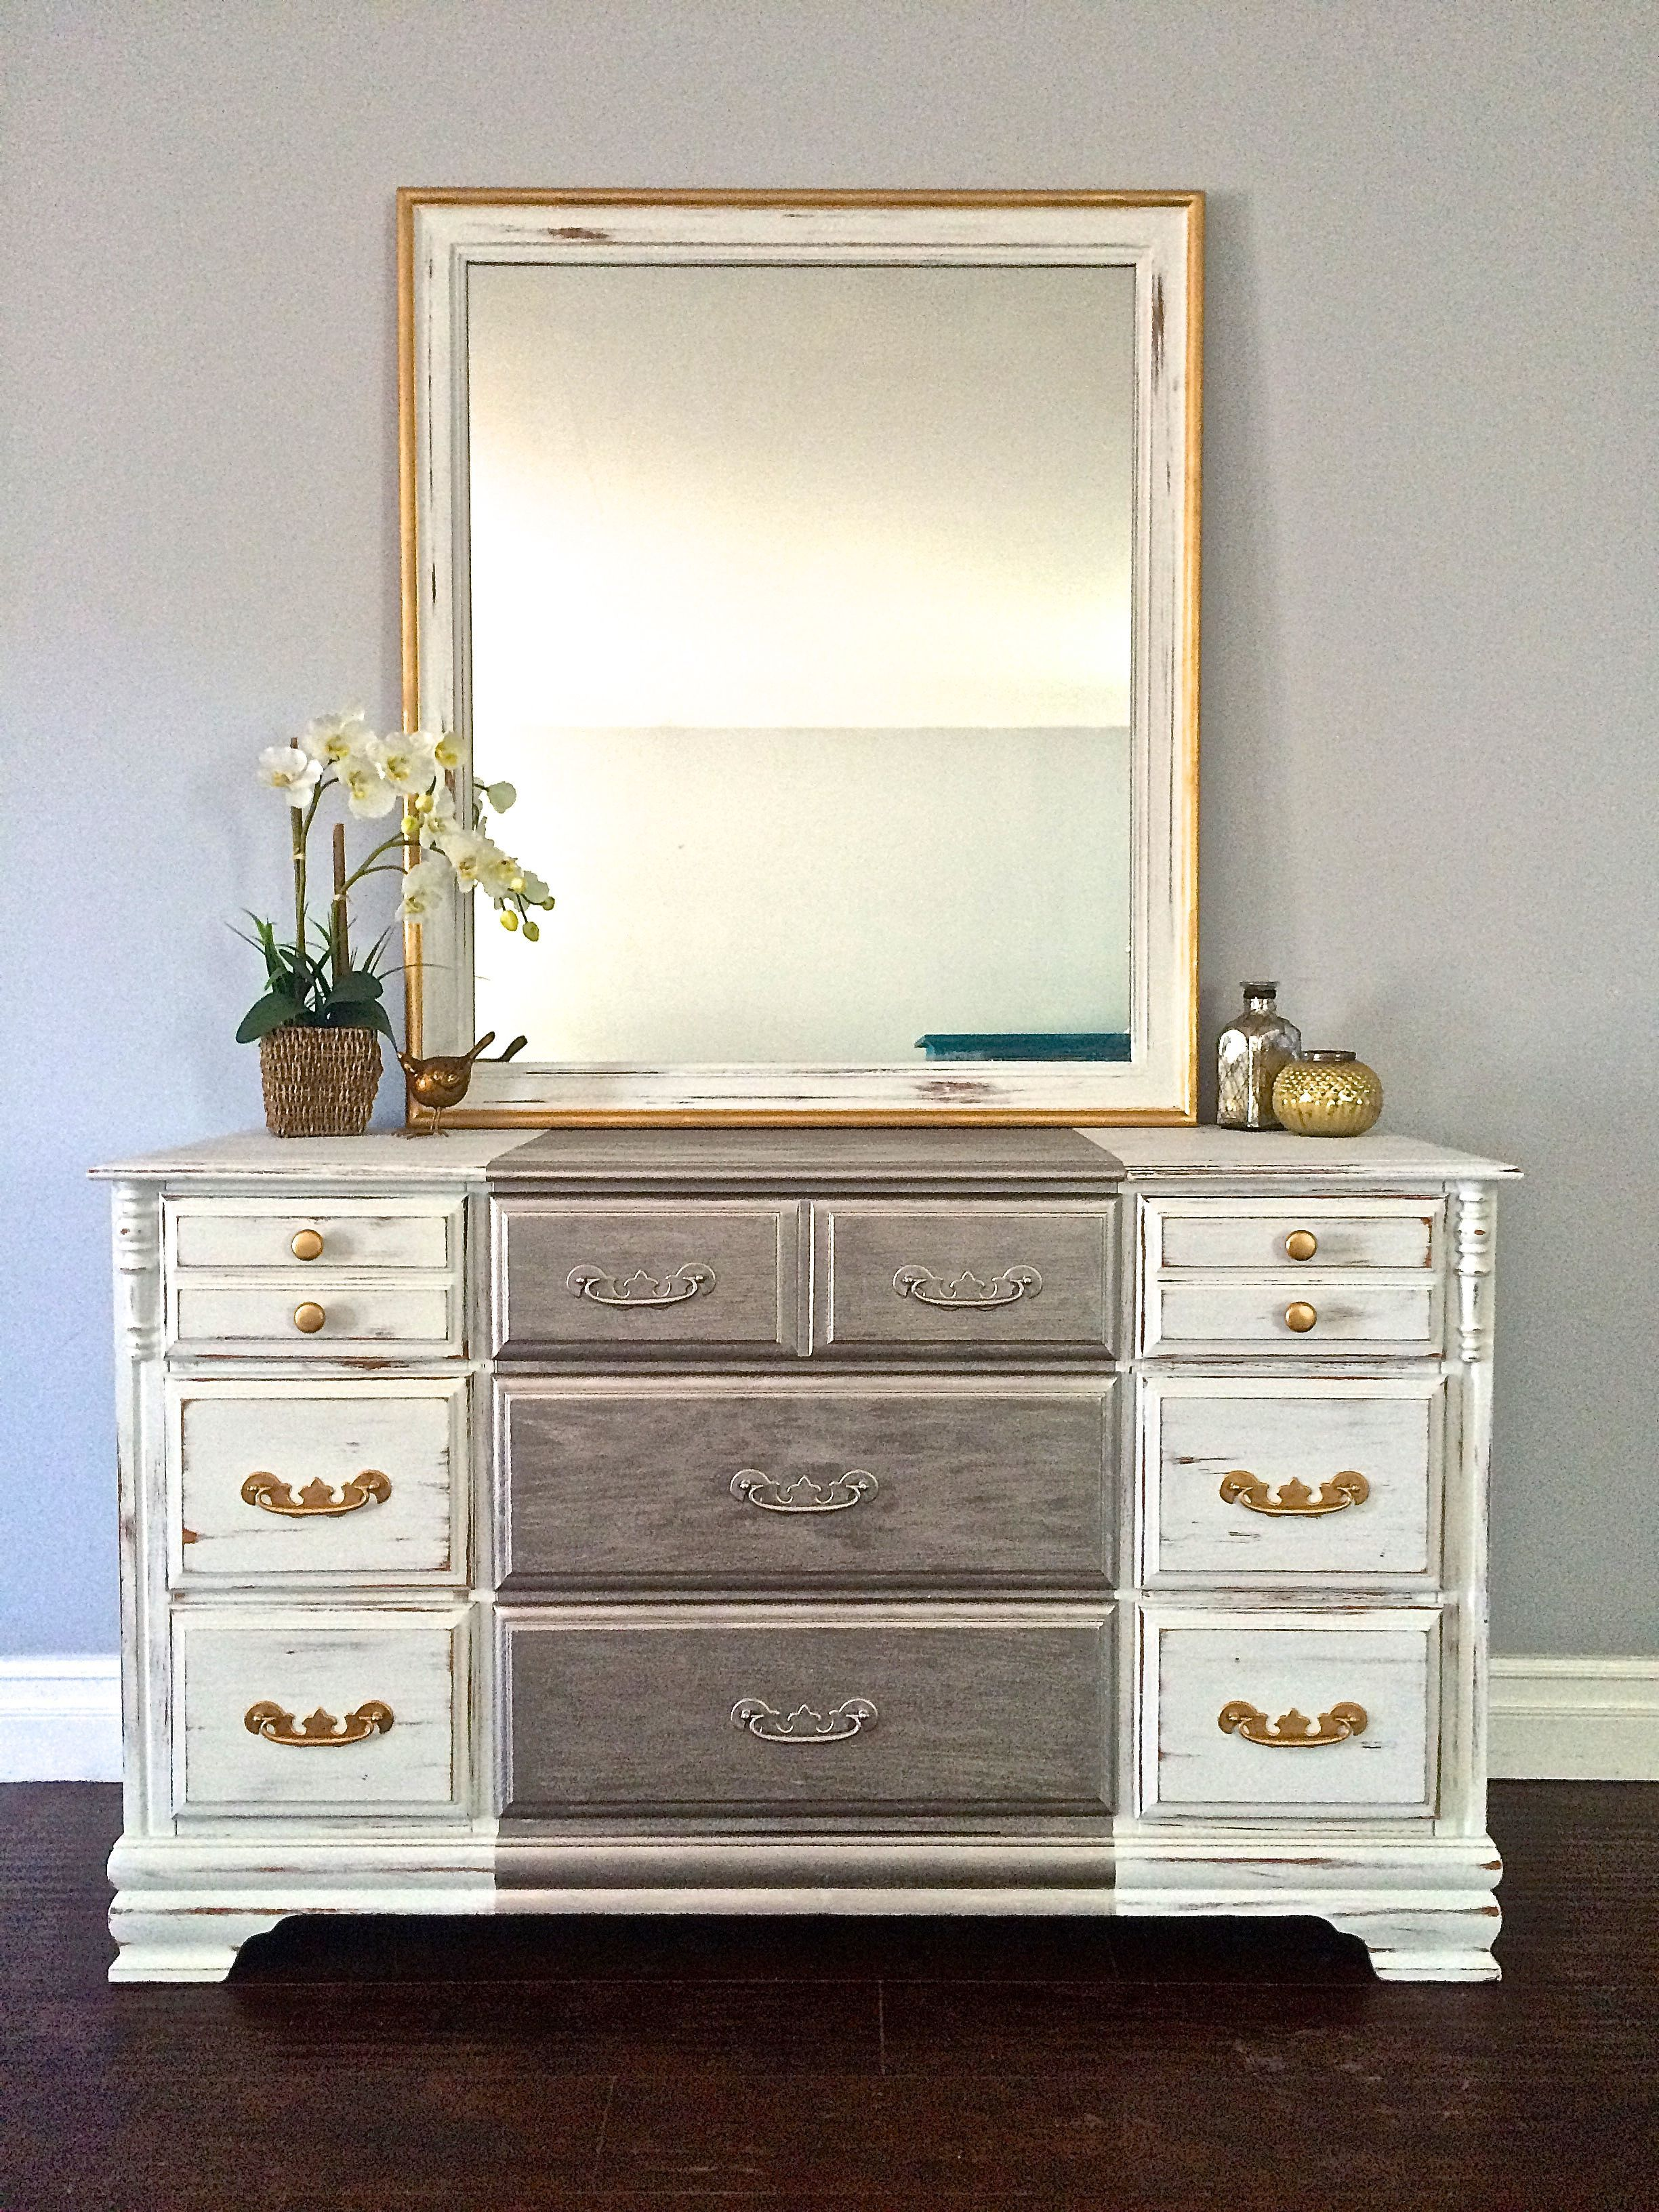 Shabby Chic White Silver & Gold Leaf 9 Drawer Dresser w Mirror